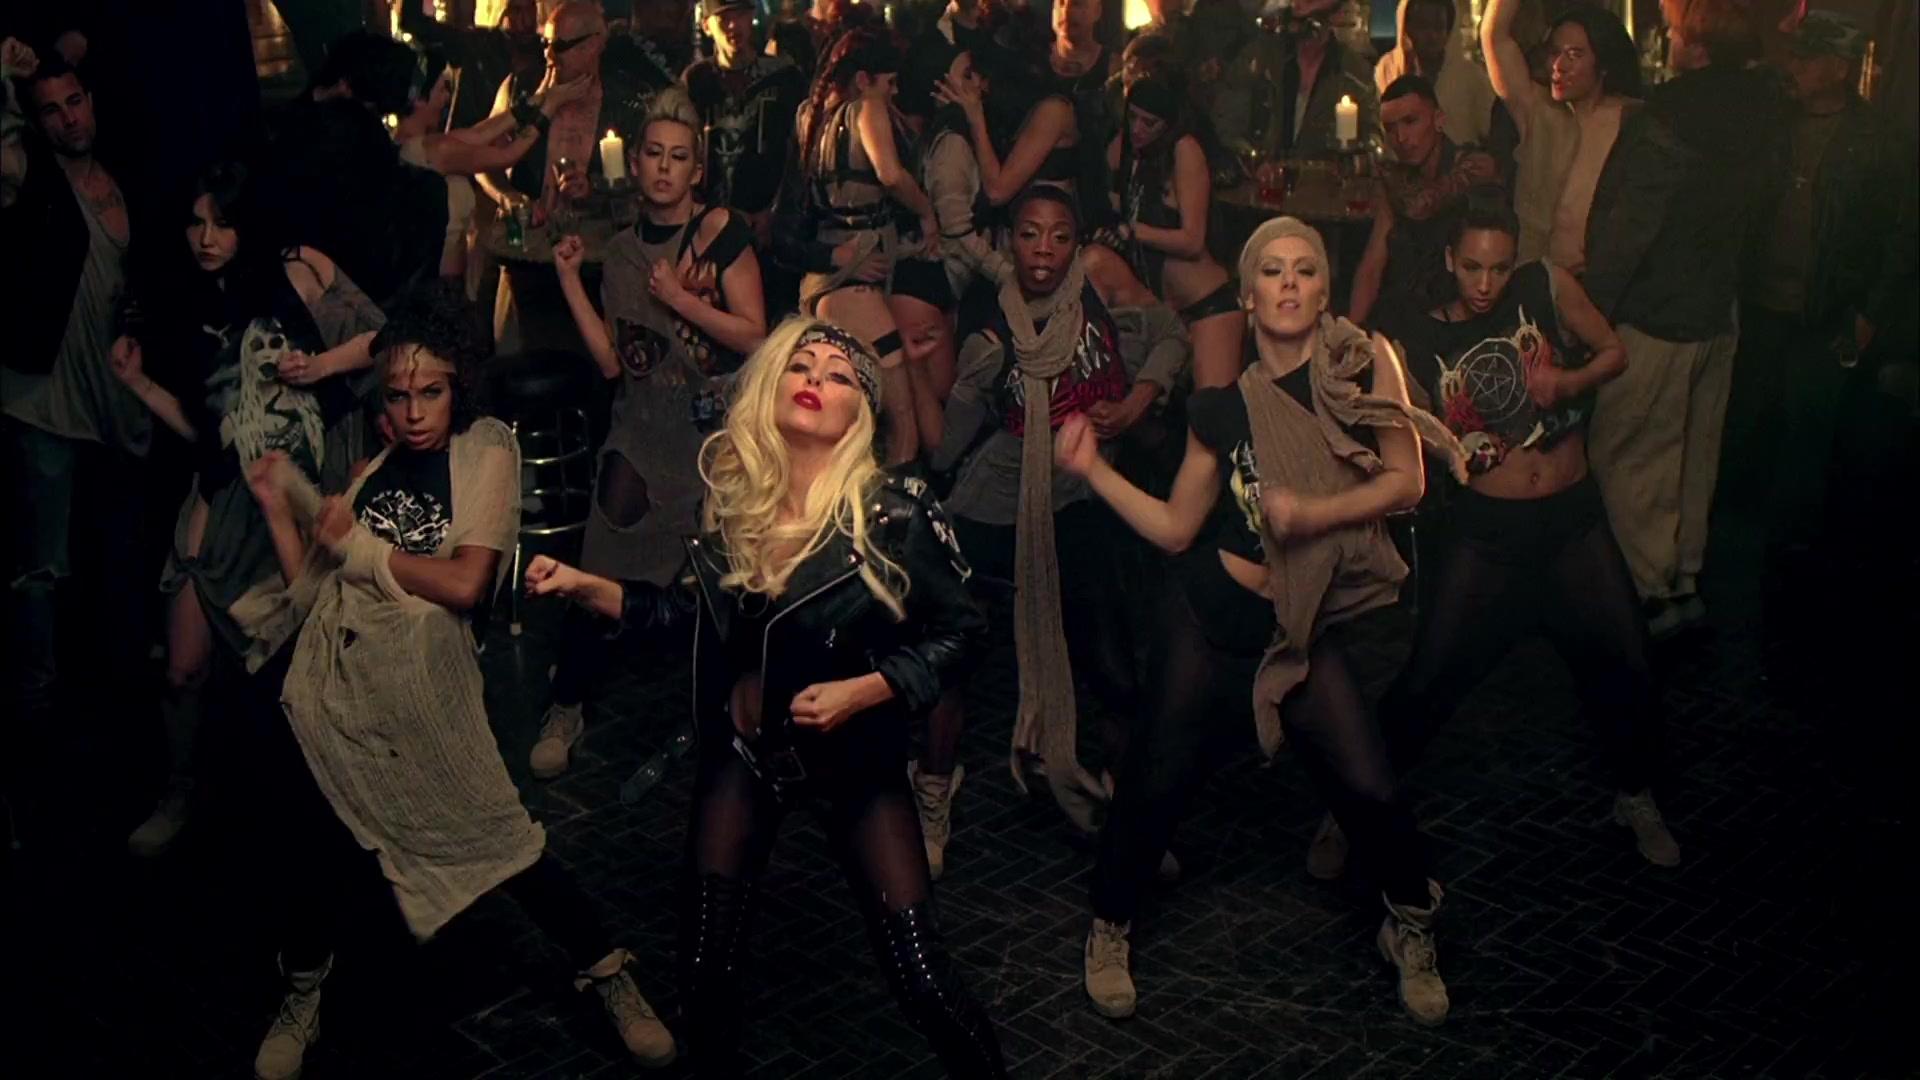 File:lady Gaga Judas 187.jpg